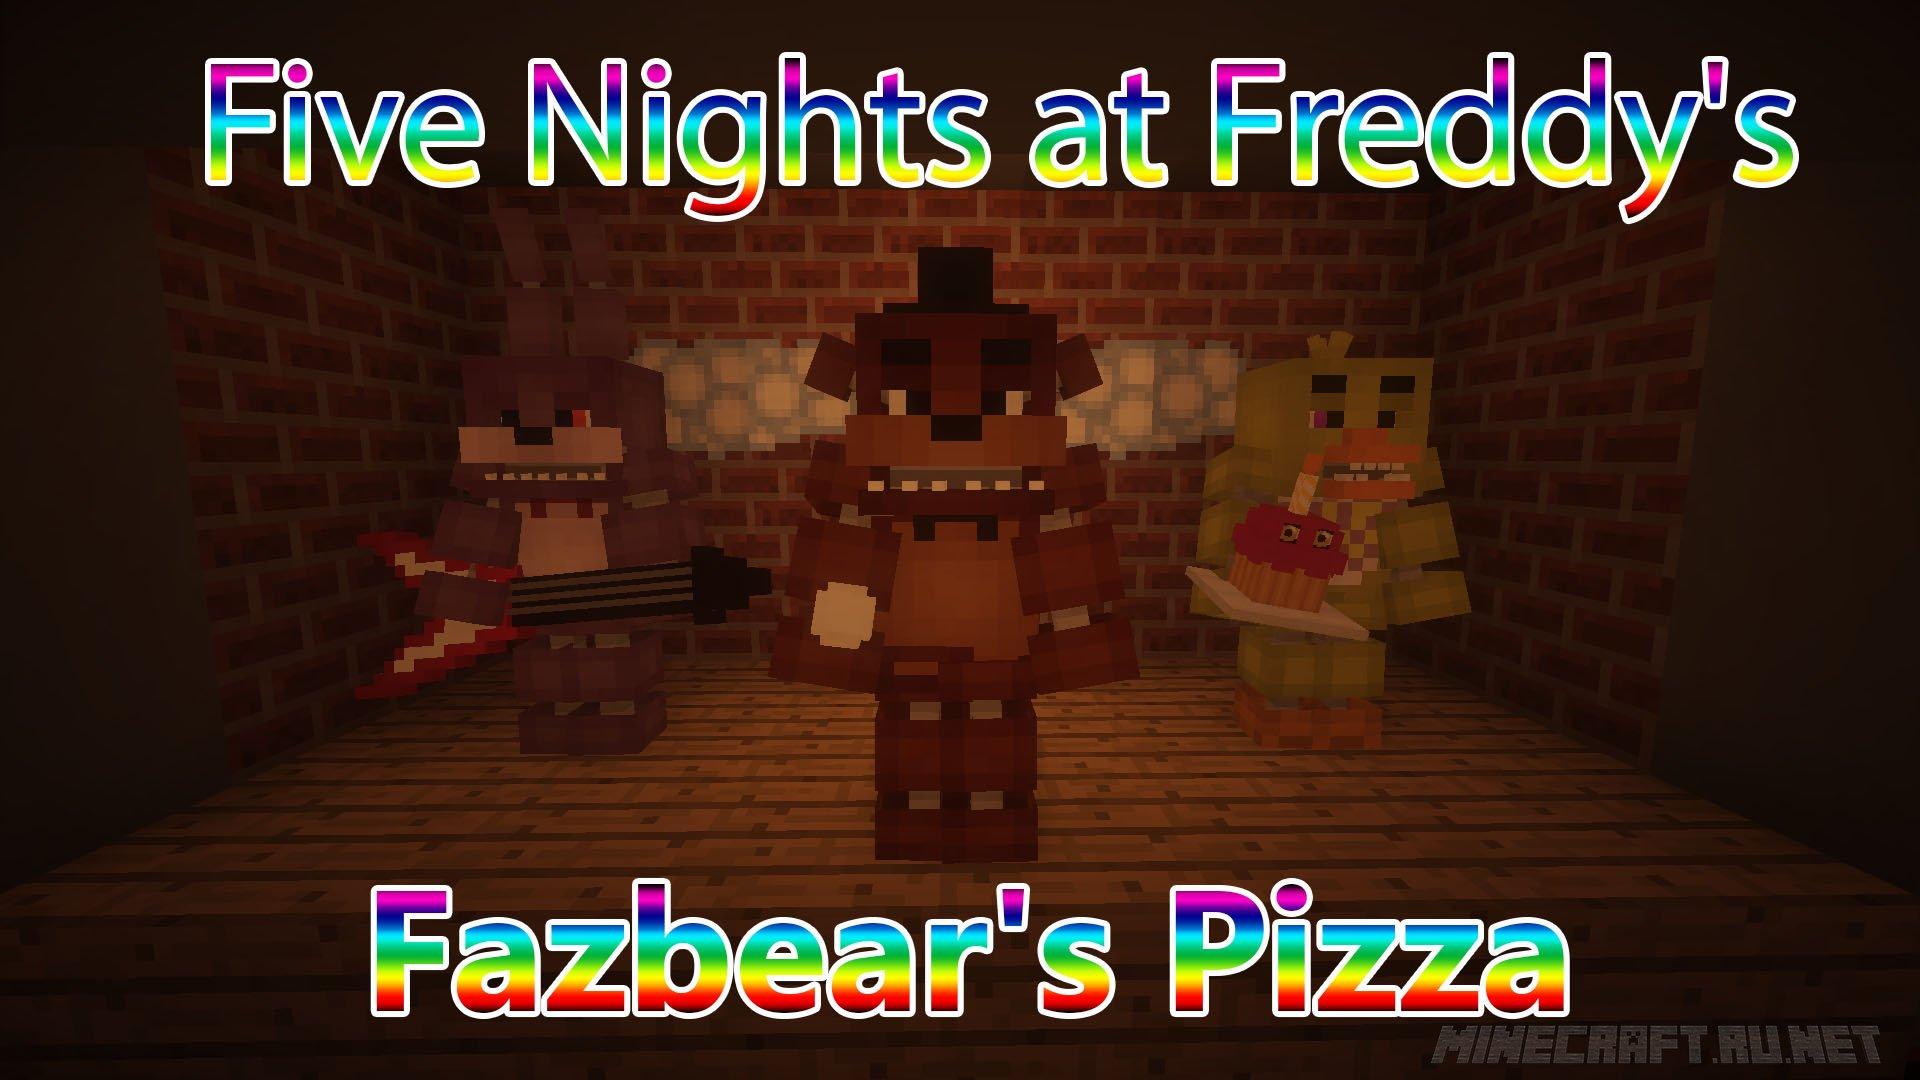 Minecraft Five Nights at Freddy's - Fazbear's Pizza (FNAF)